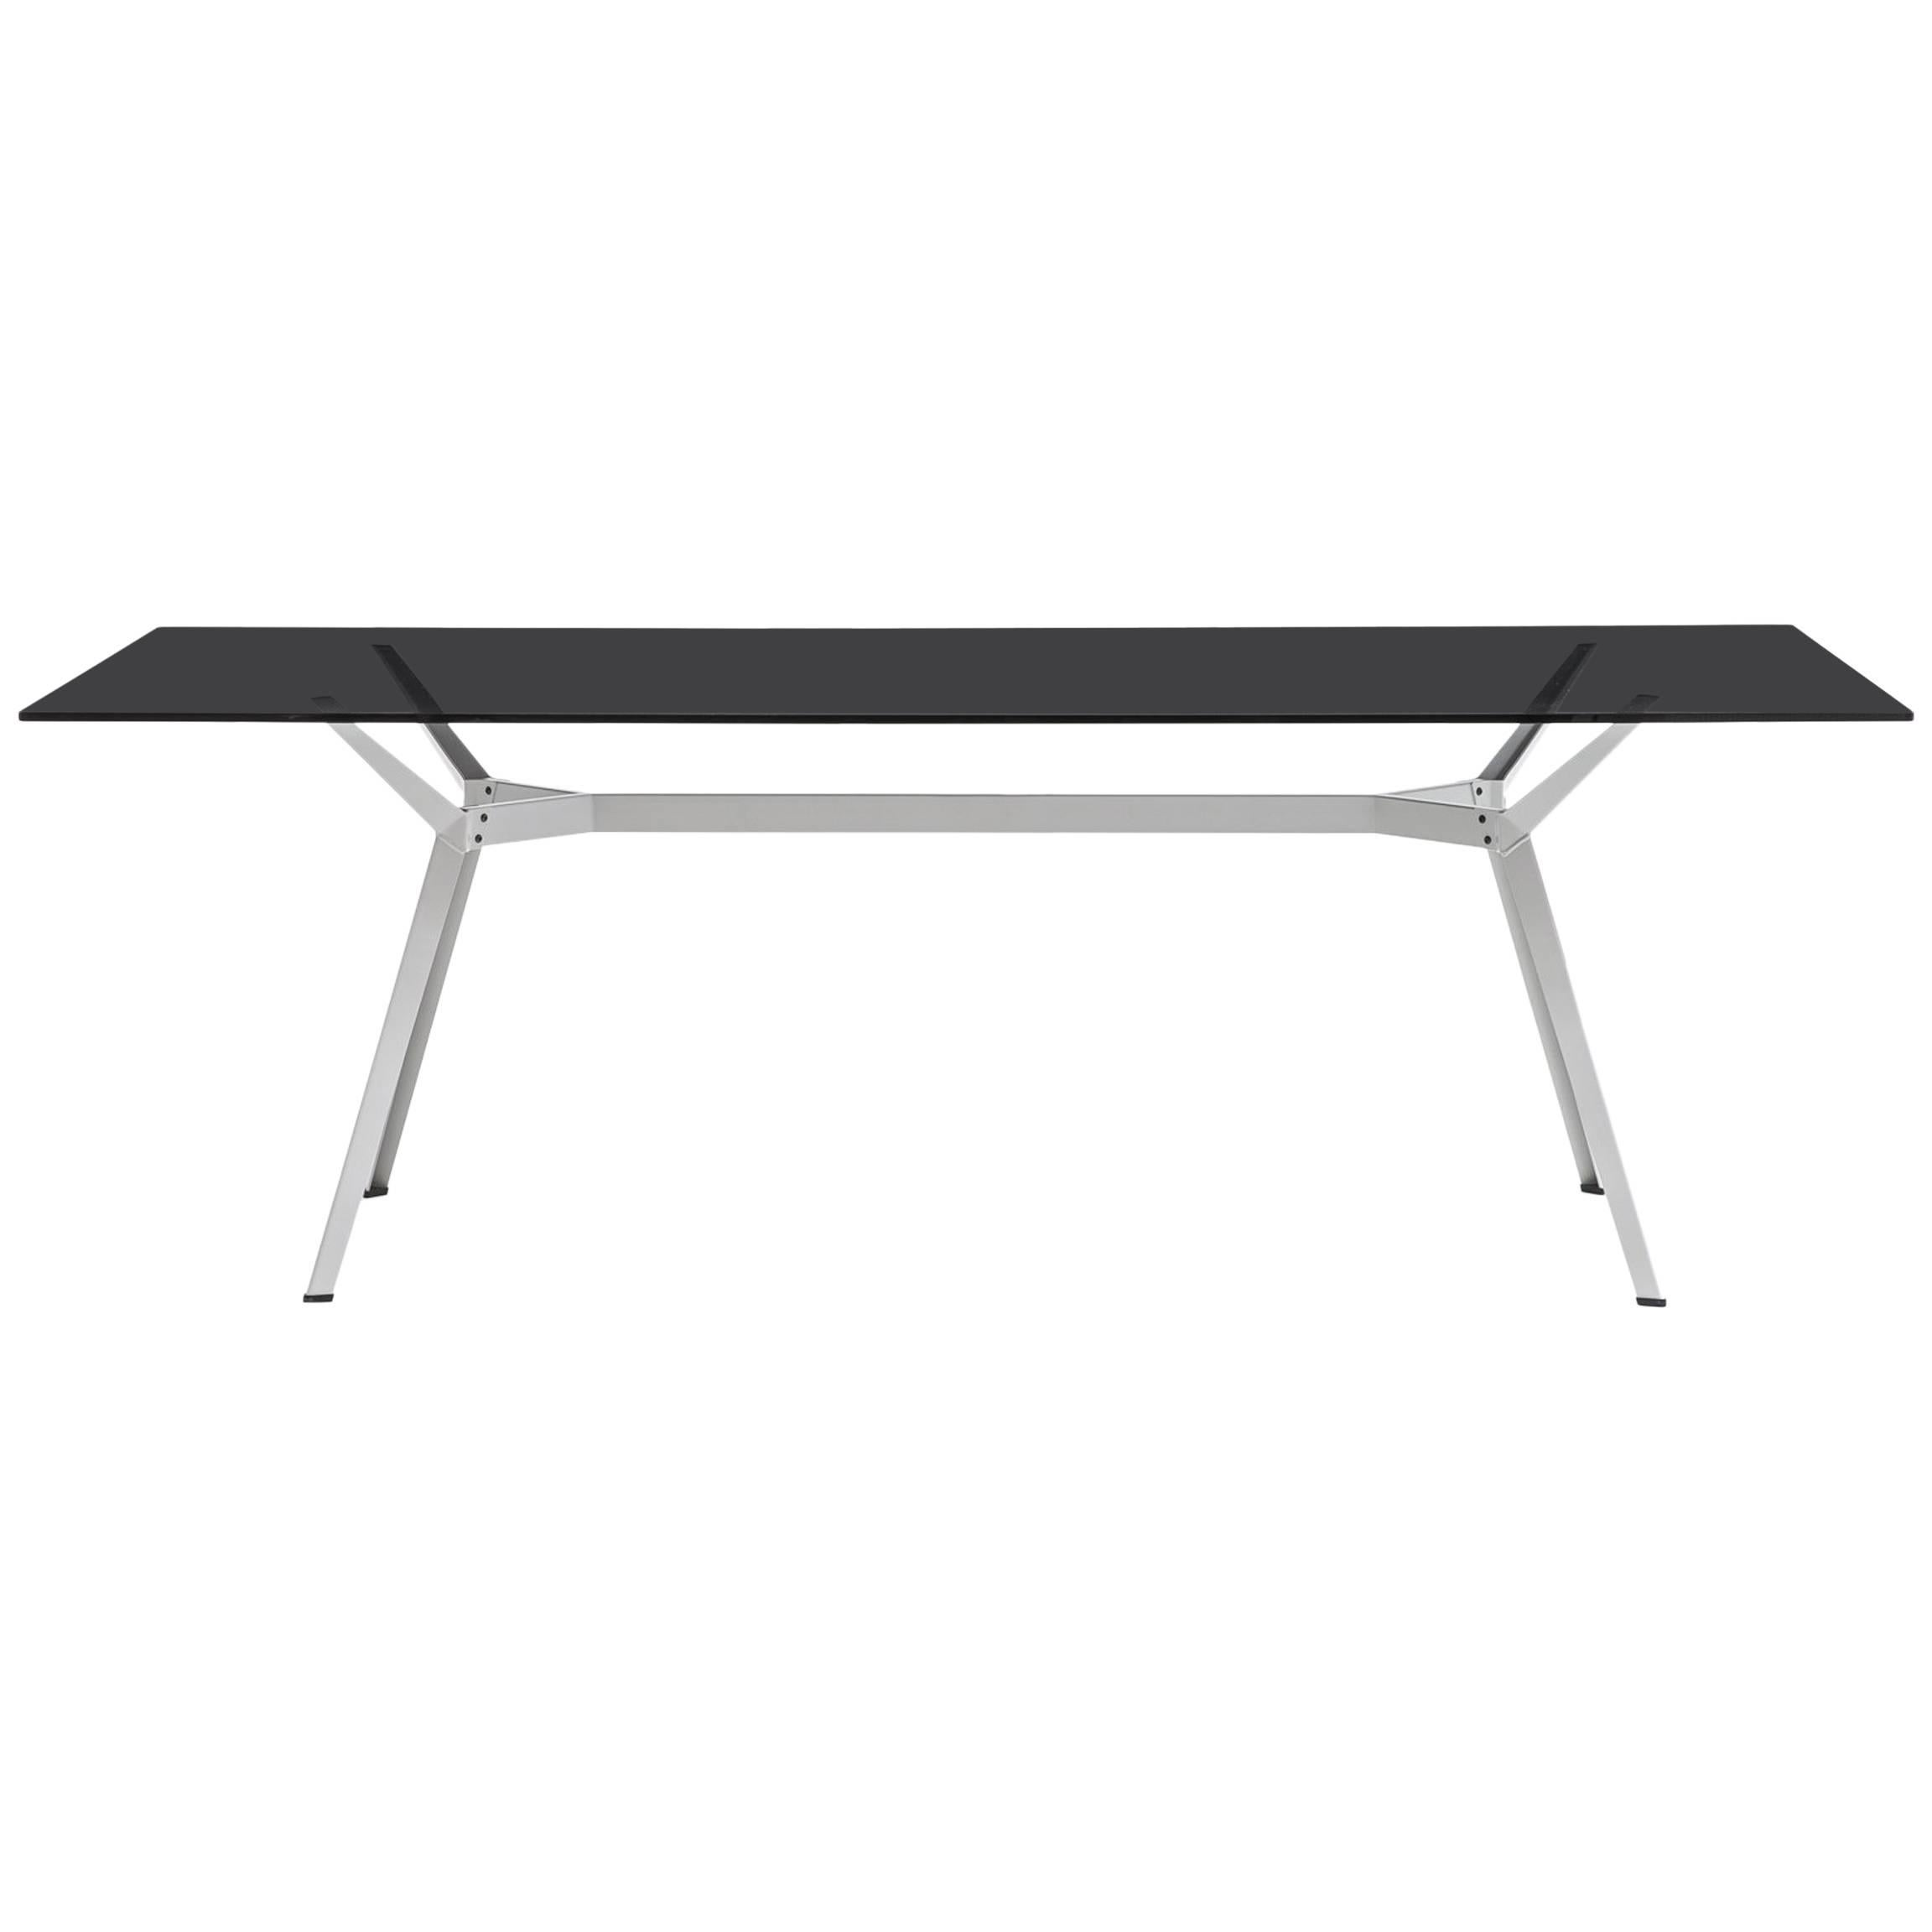 U201cPylon Fumeu0027u201d Rectangular Table In Smoked Glass And Steel By Moroso For  Diesel